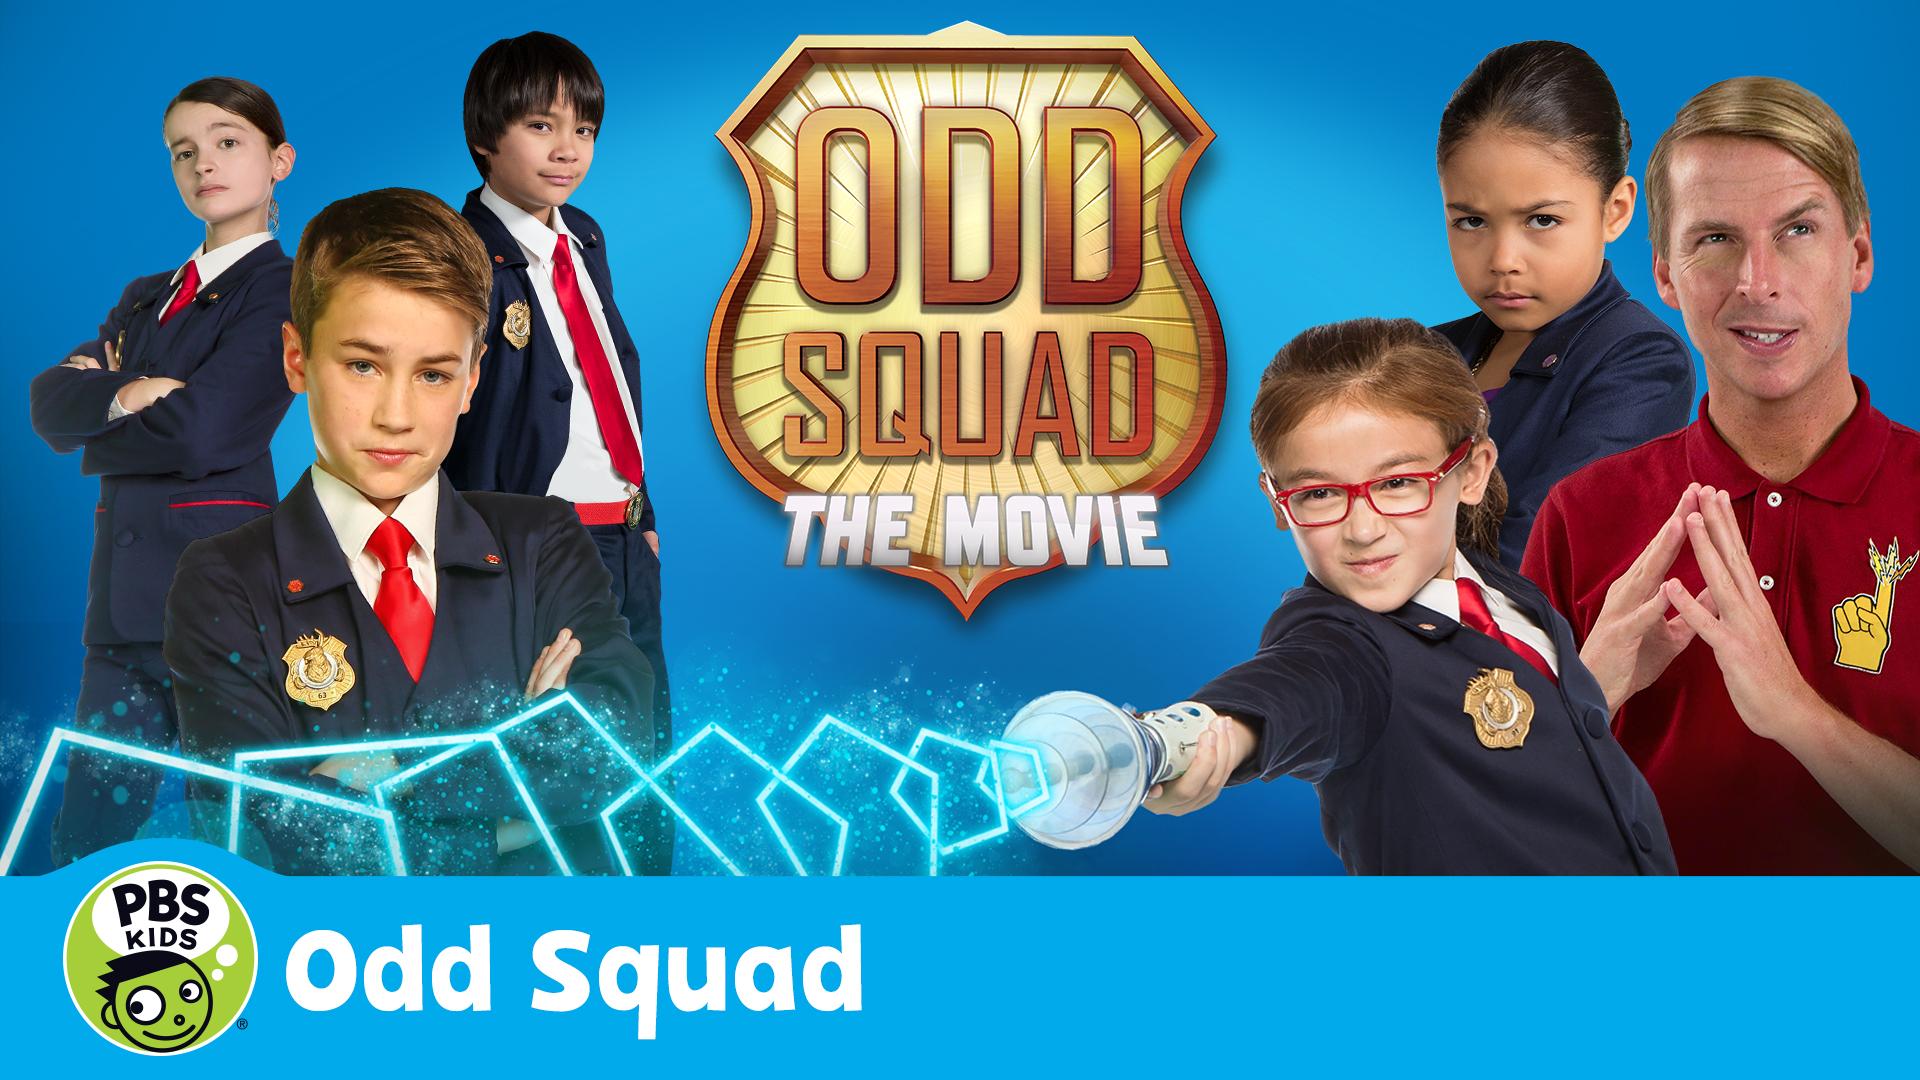 Odd Squad: The Movie